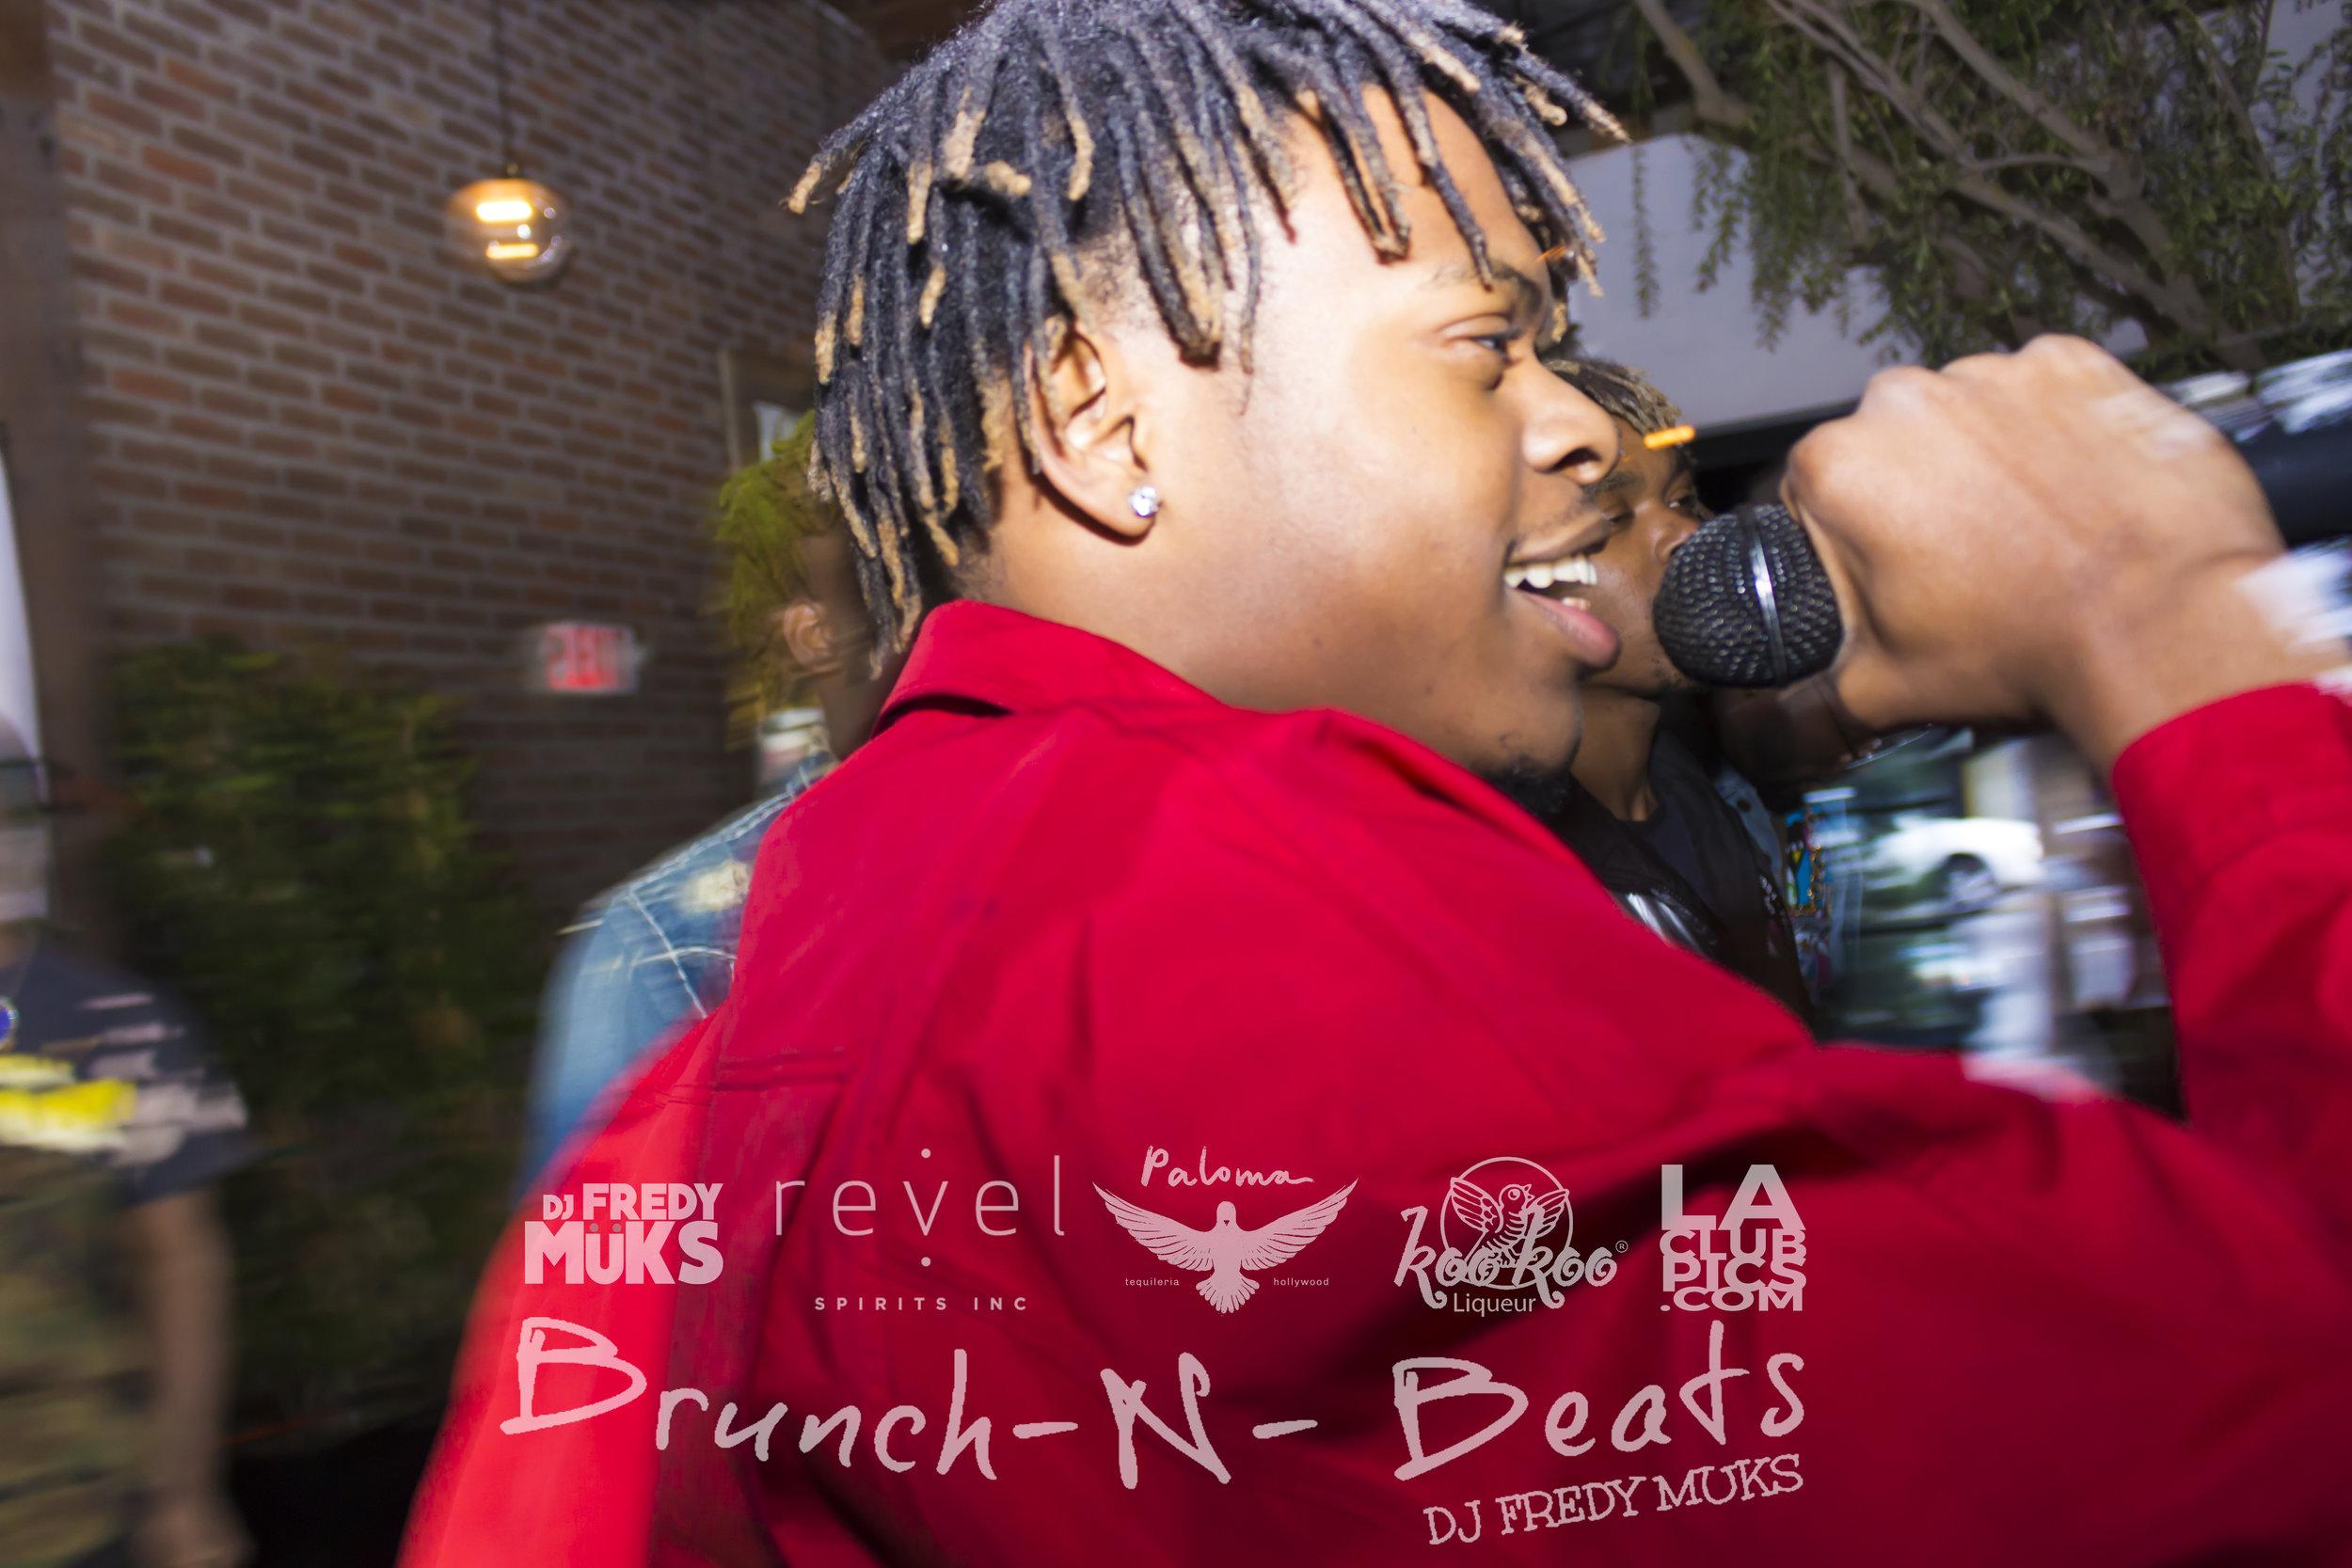 Brunch-N-Beats - Paloma Hollywood - 02-25-18_238.jpg